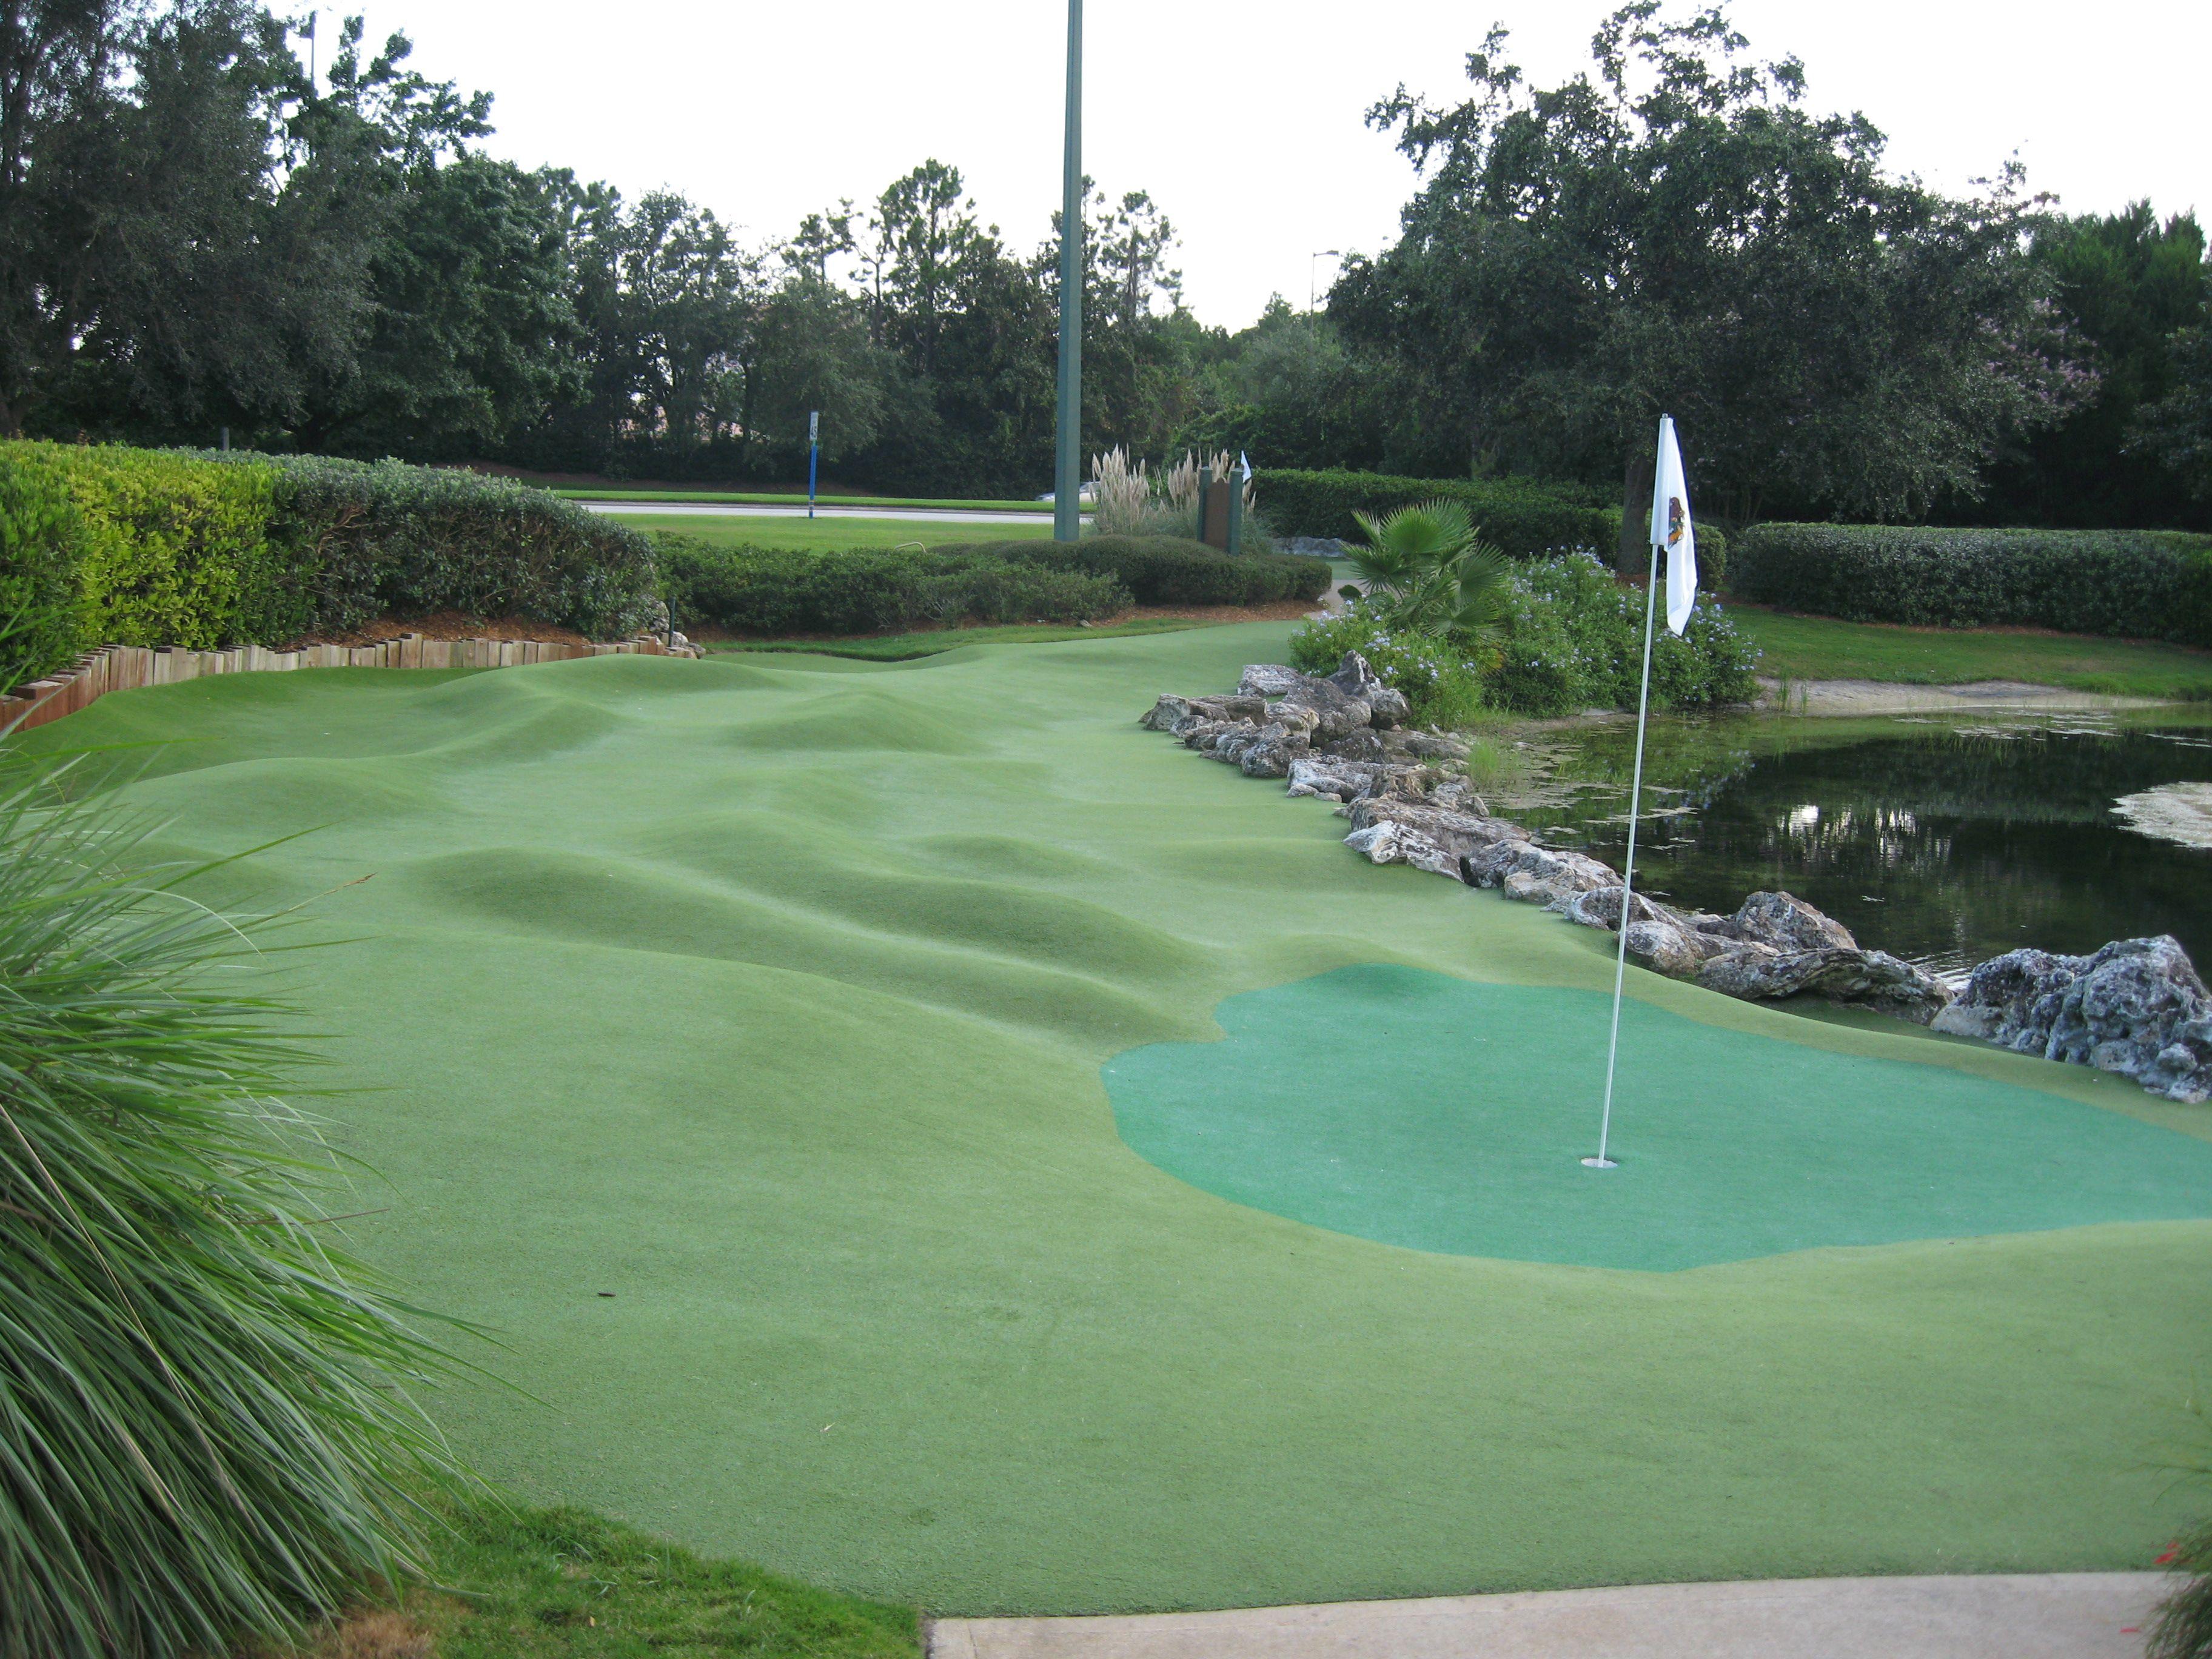 Fantasia Gardens Miniature Golf Fairways Course The